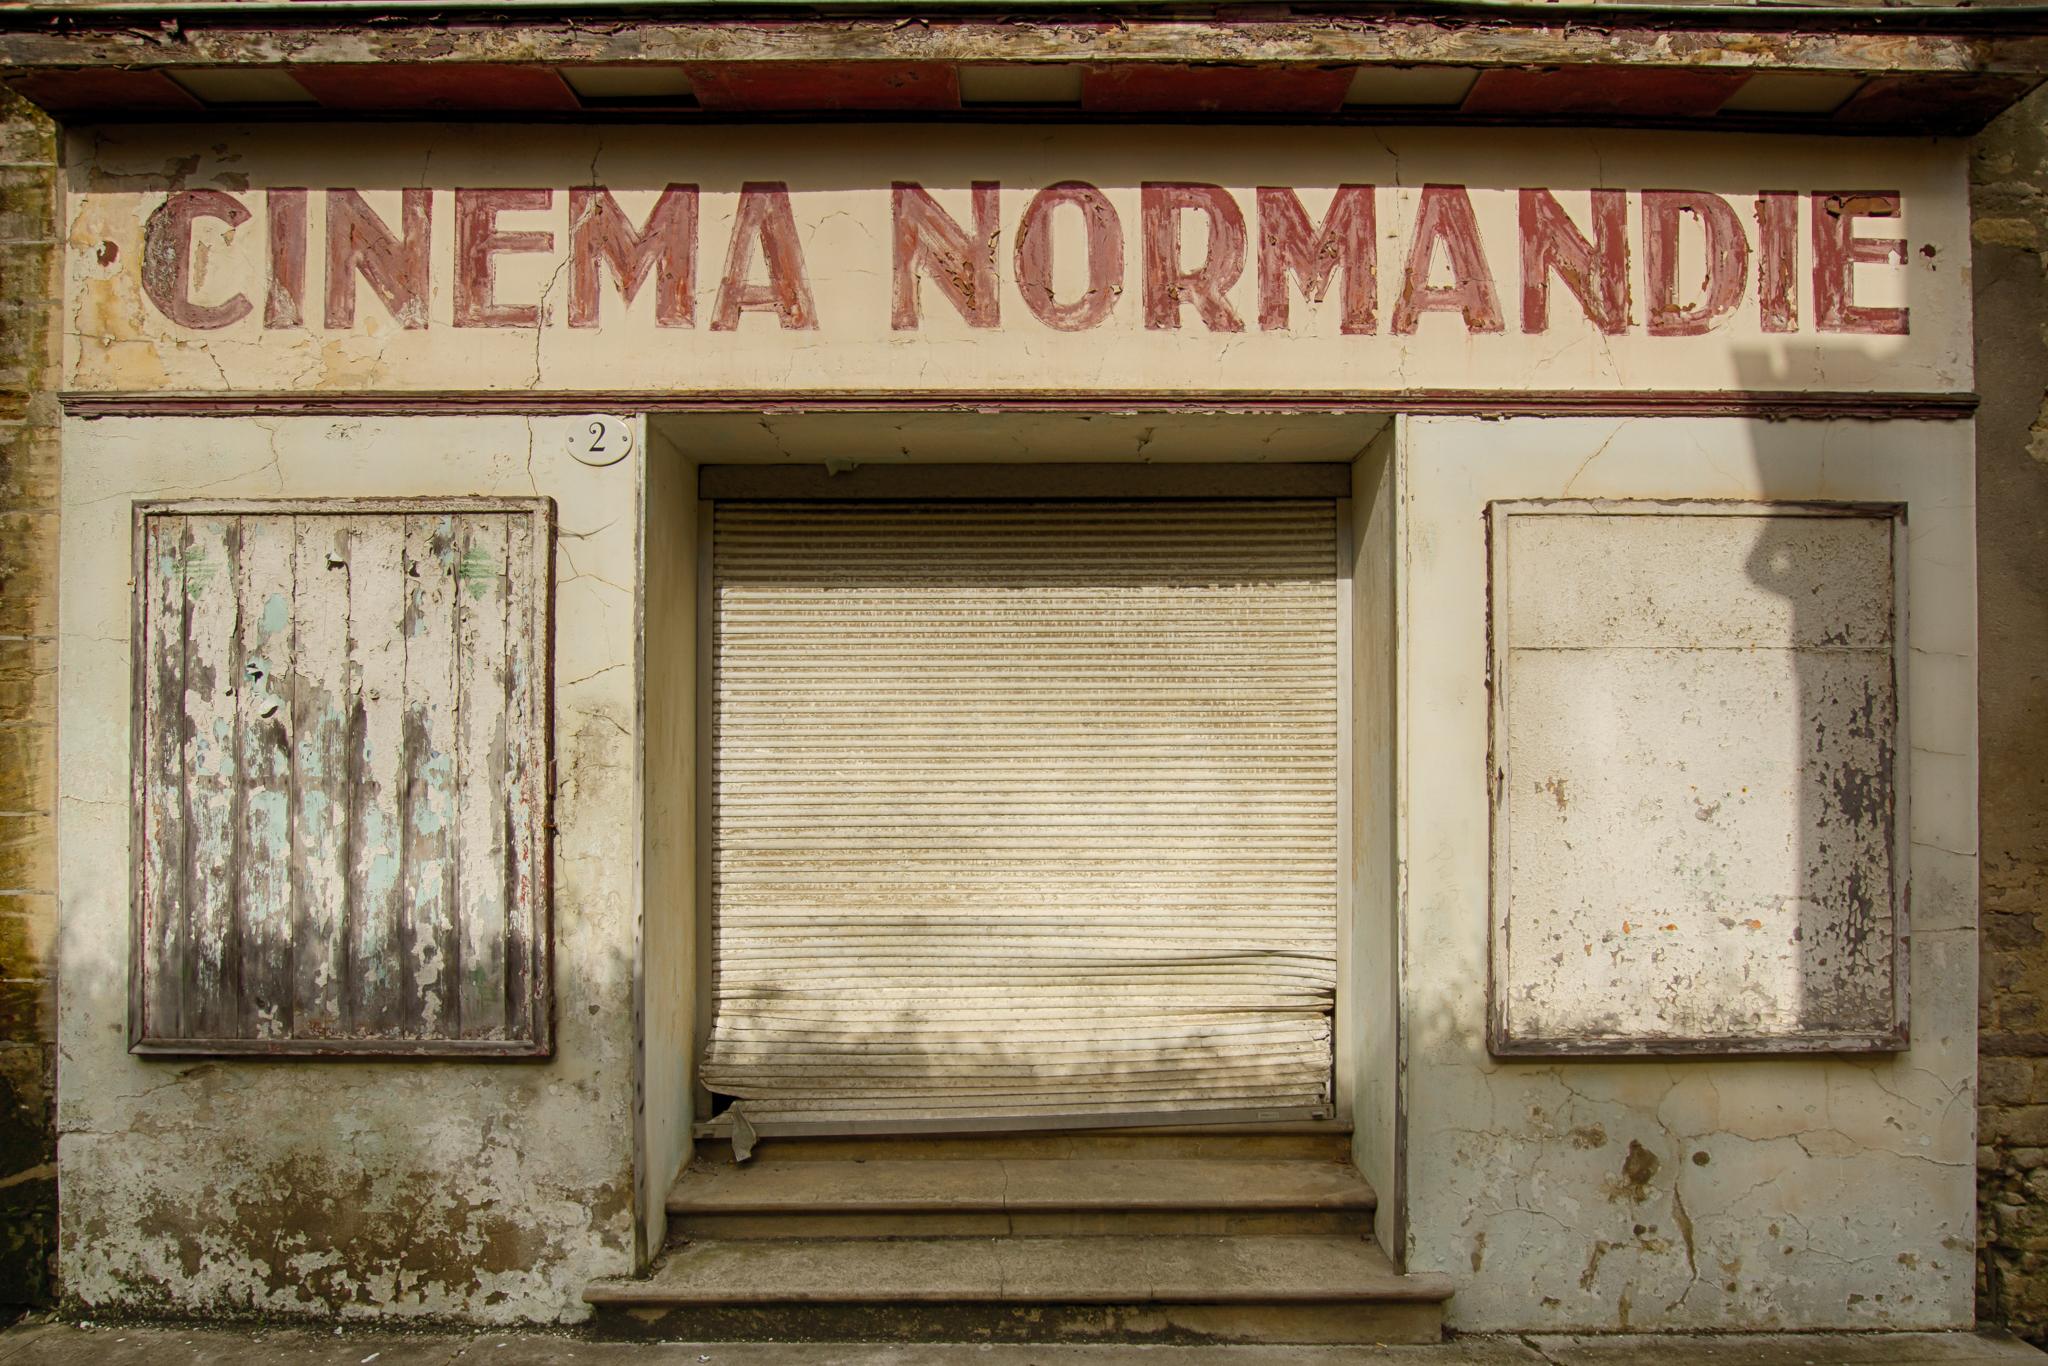 Cinema Normandie